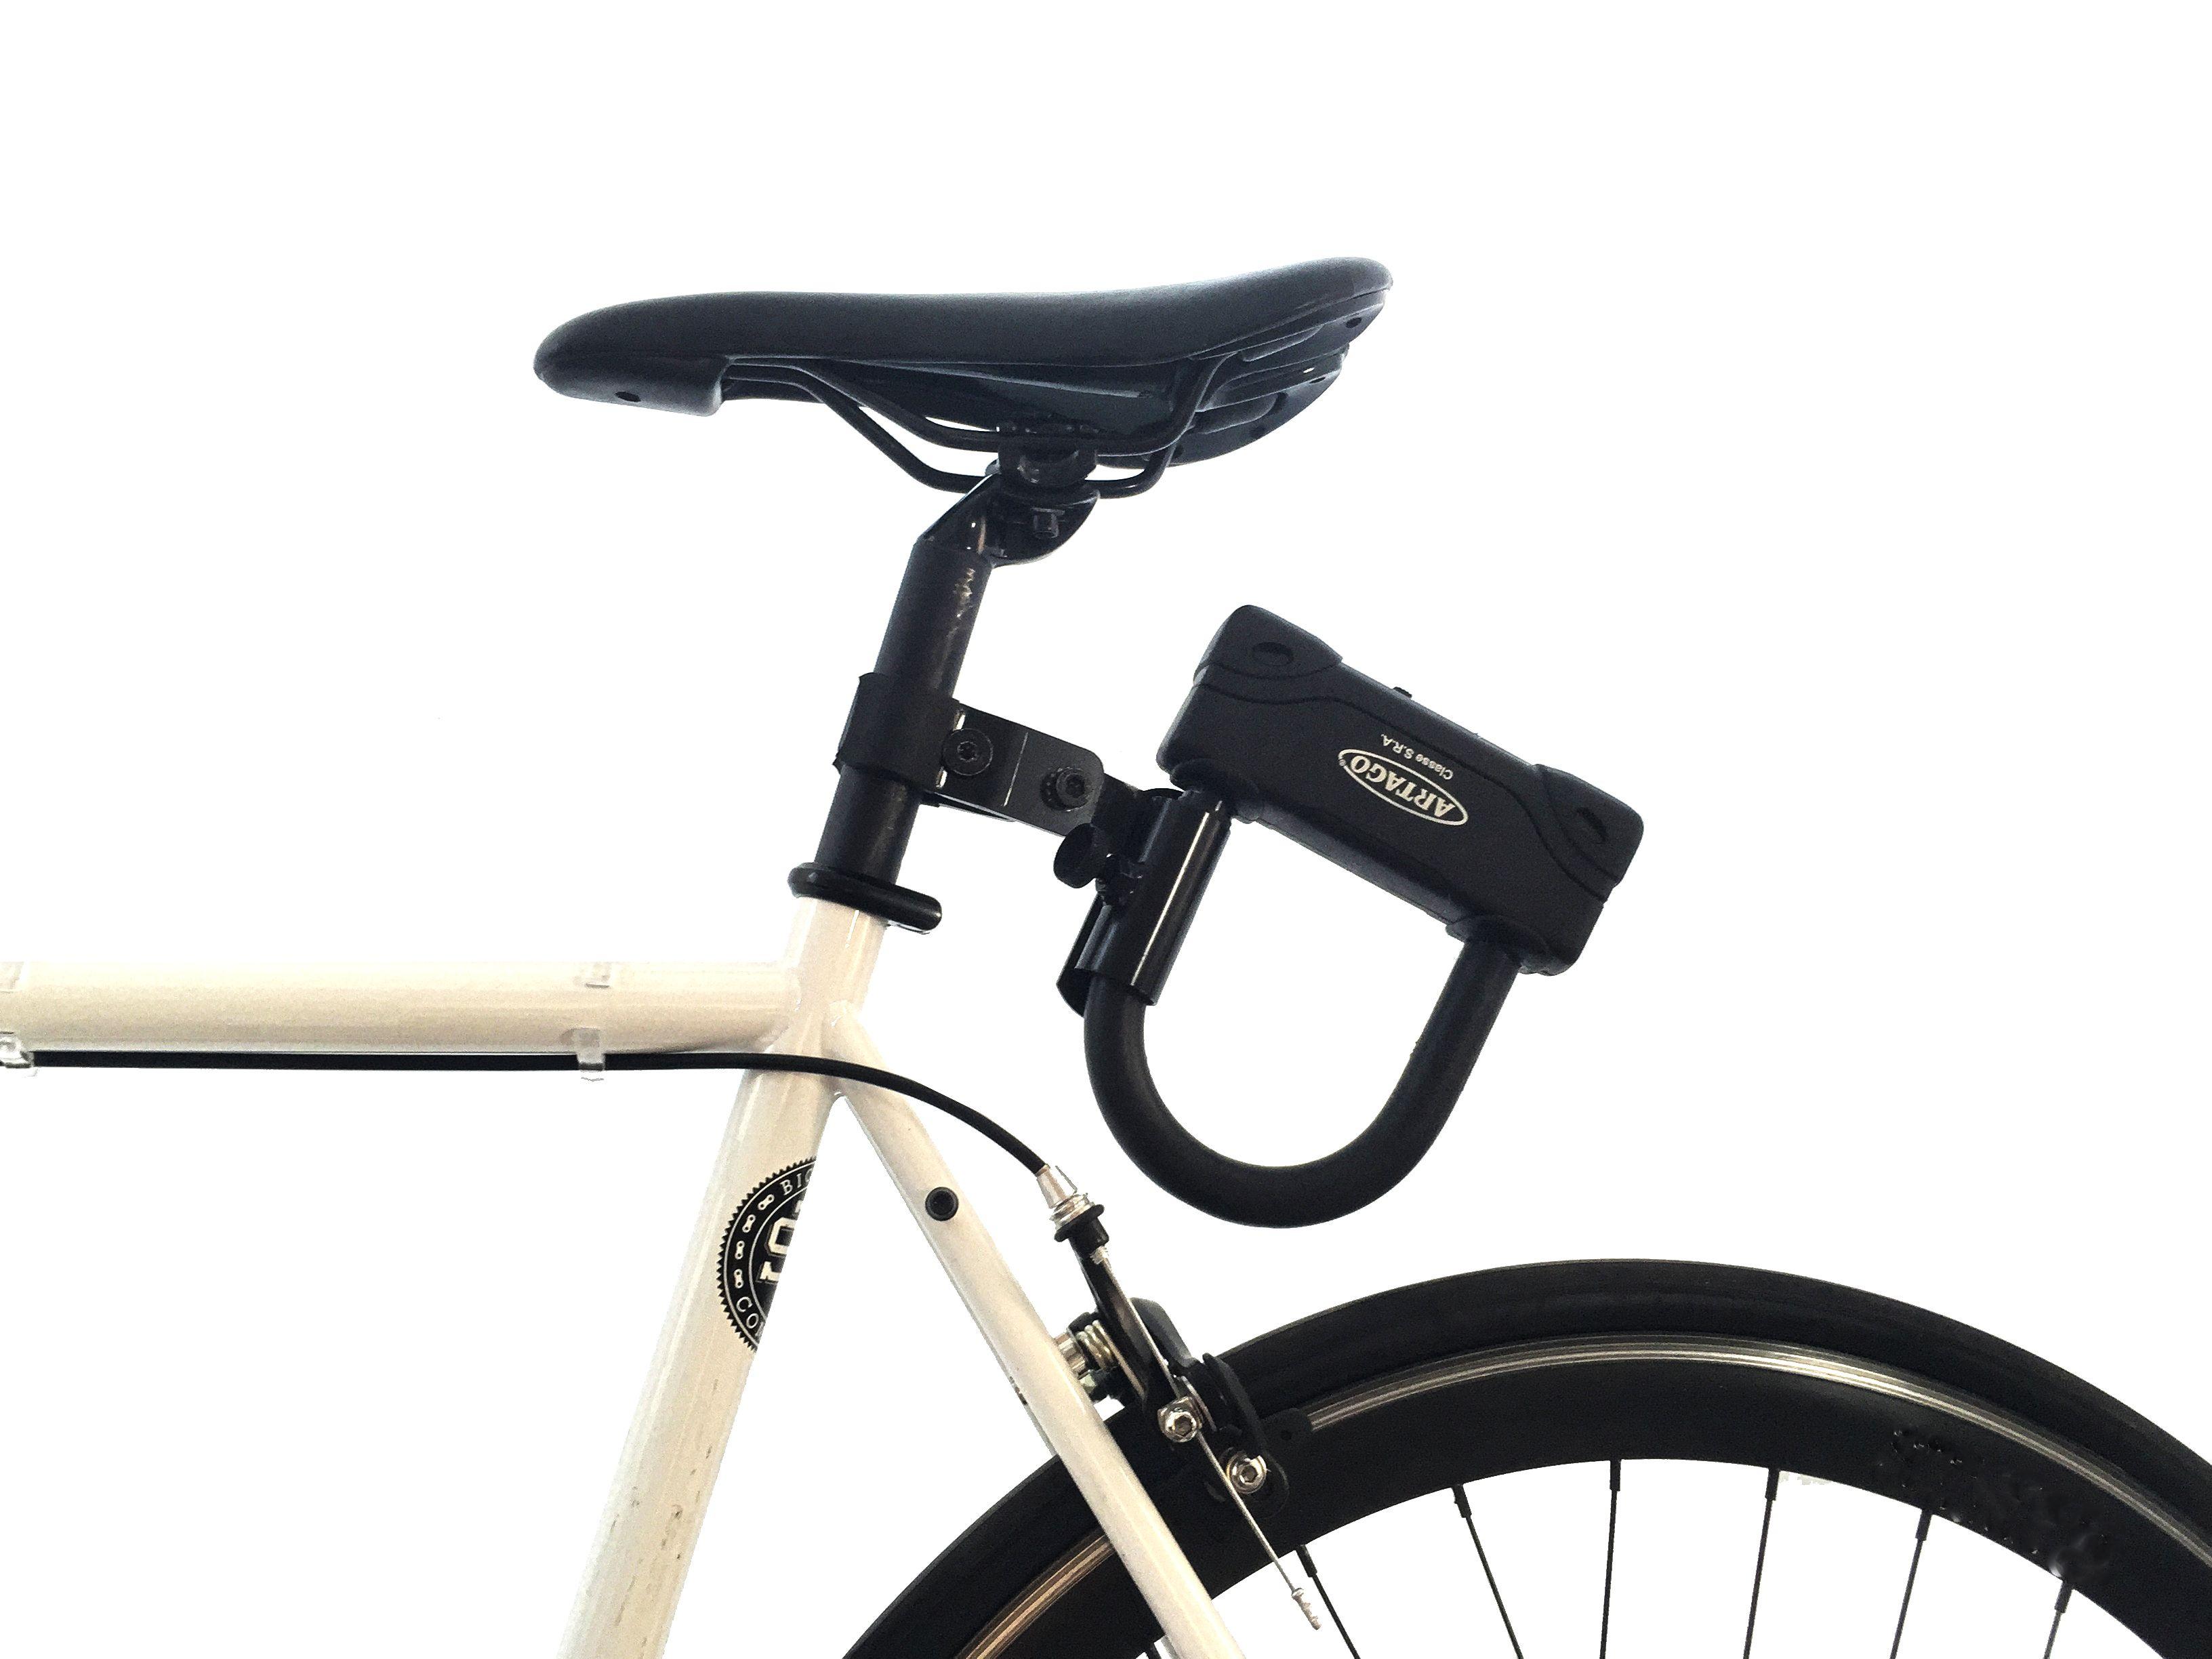 Artago Bicycle U Lock Holder Triathlon Bike Cycling Bikes Bicycle